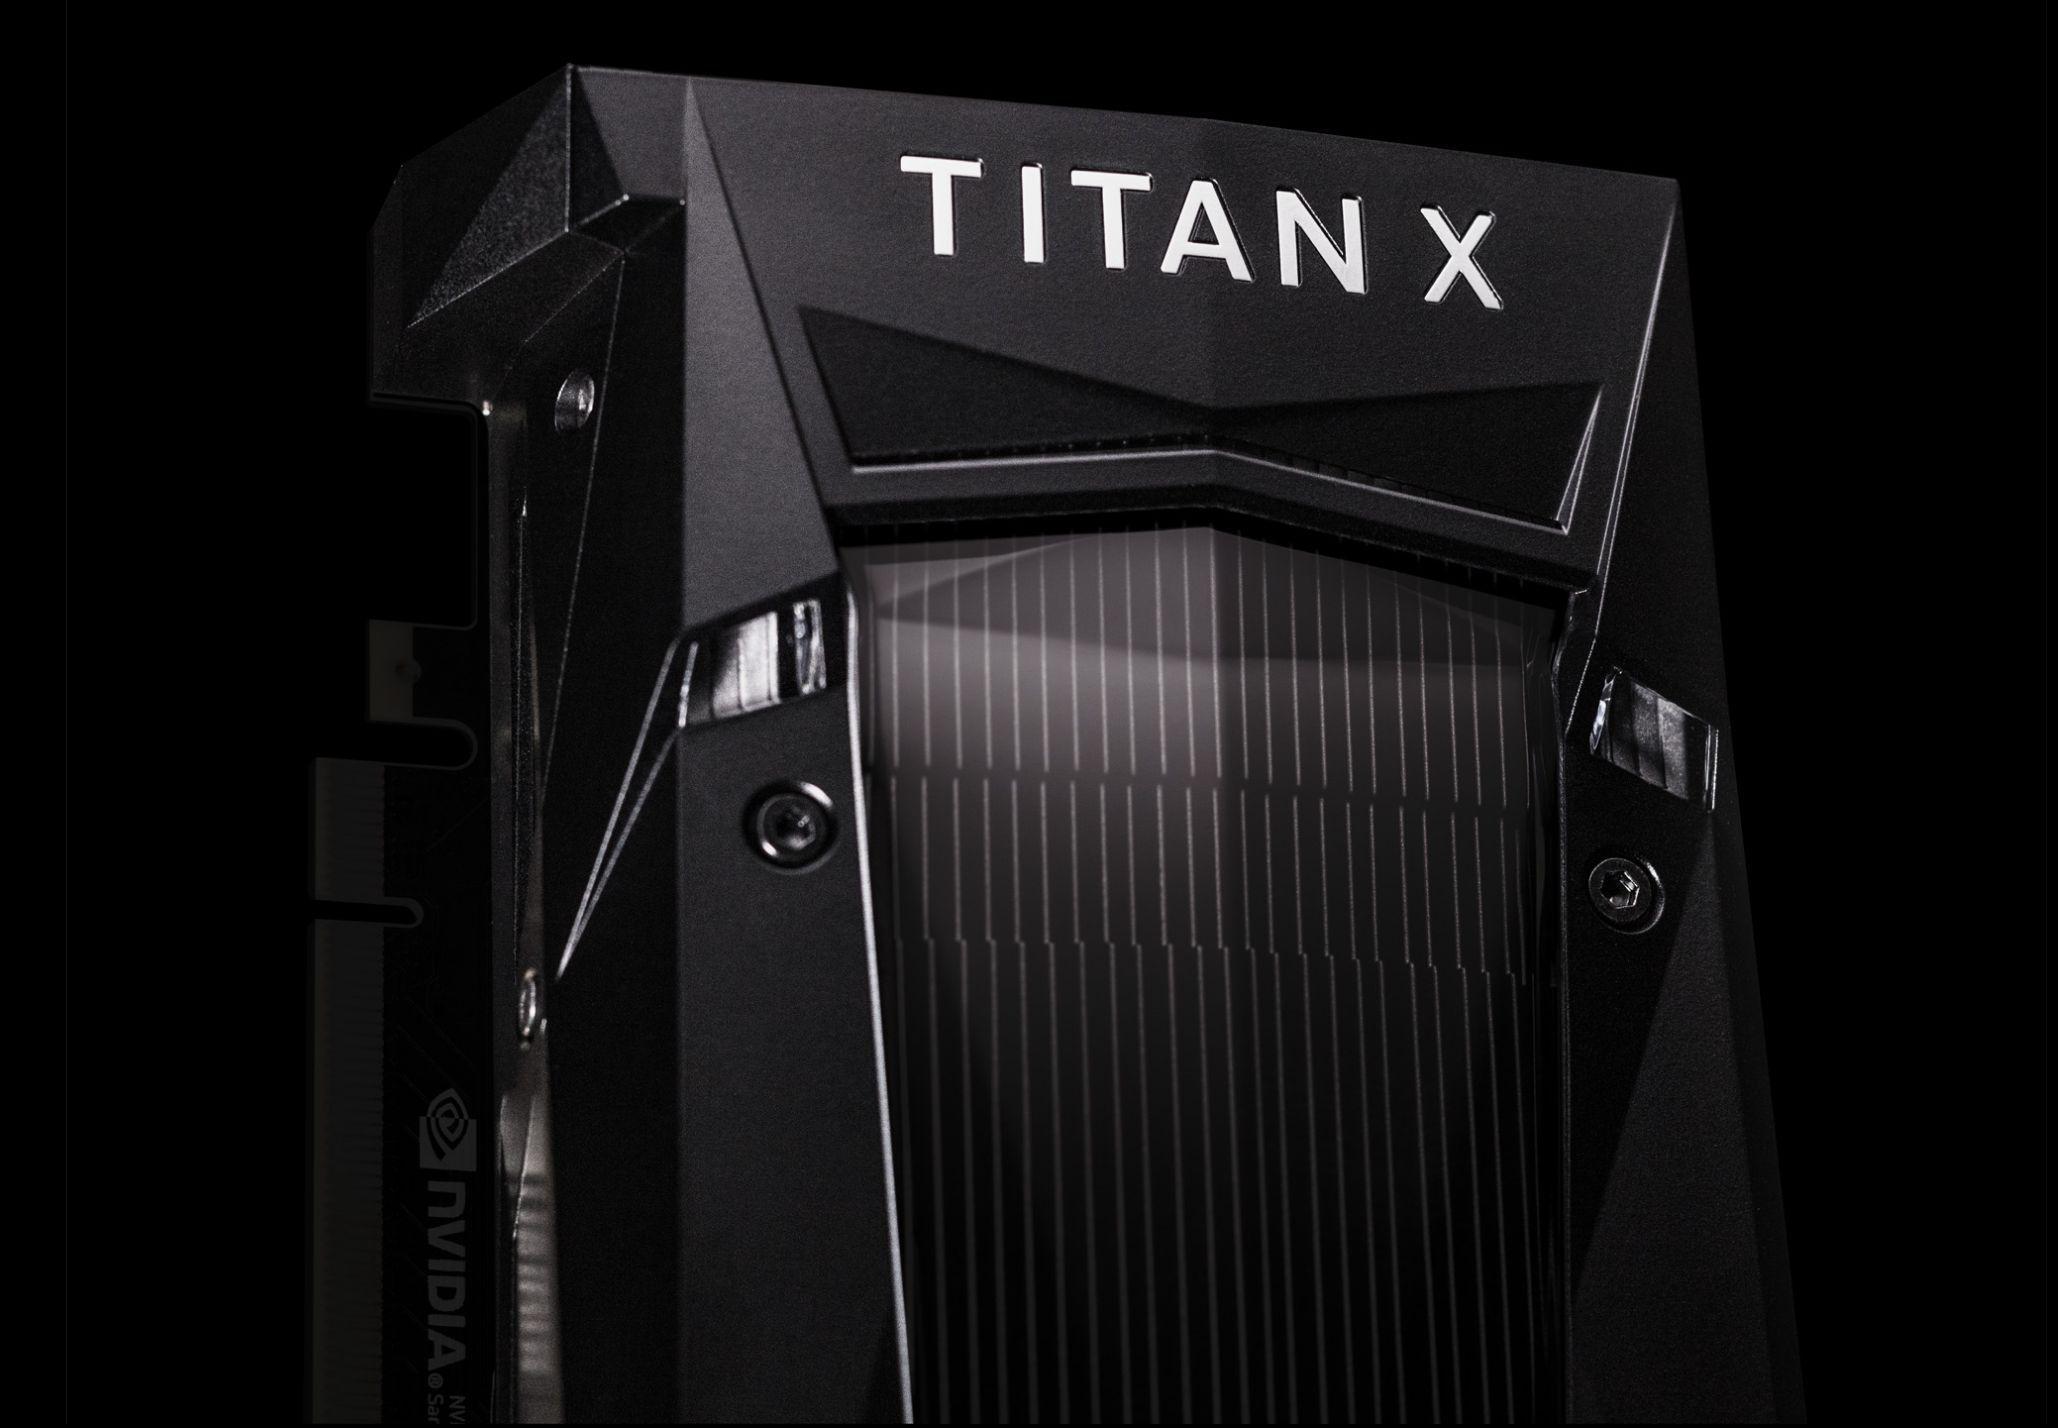 titan black vs 1080 ti